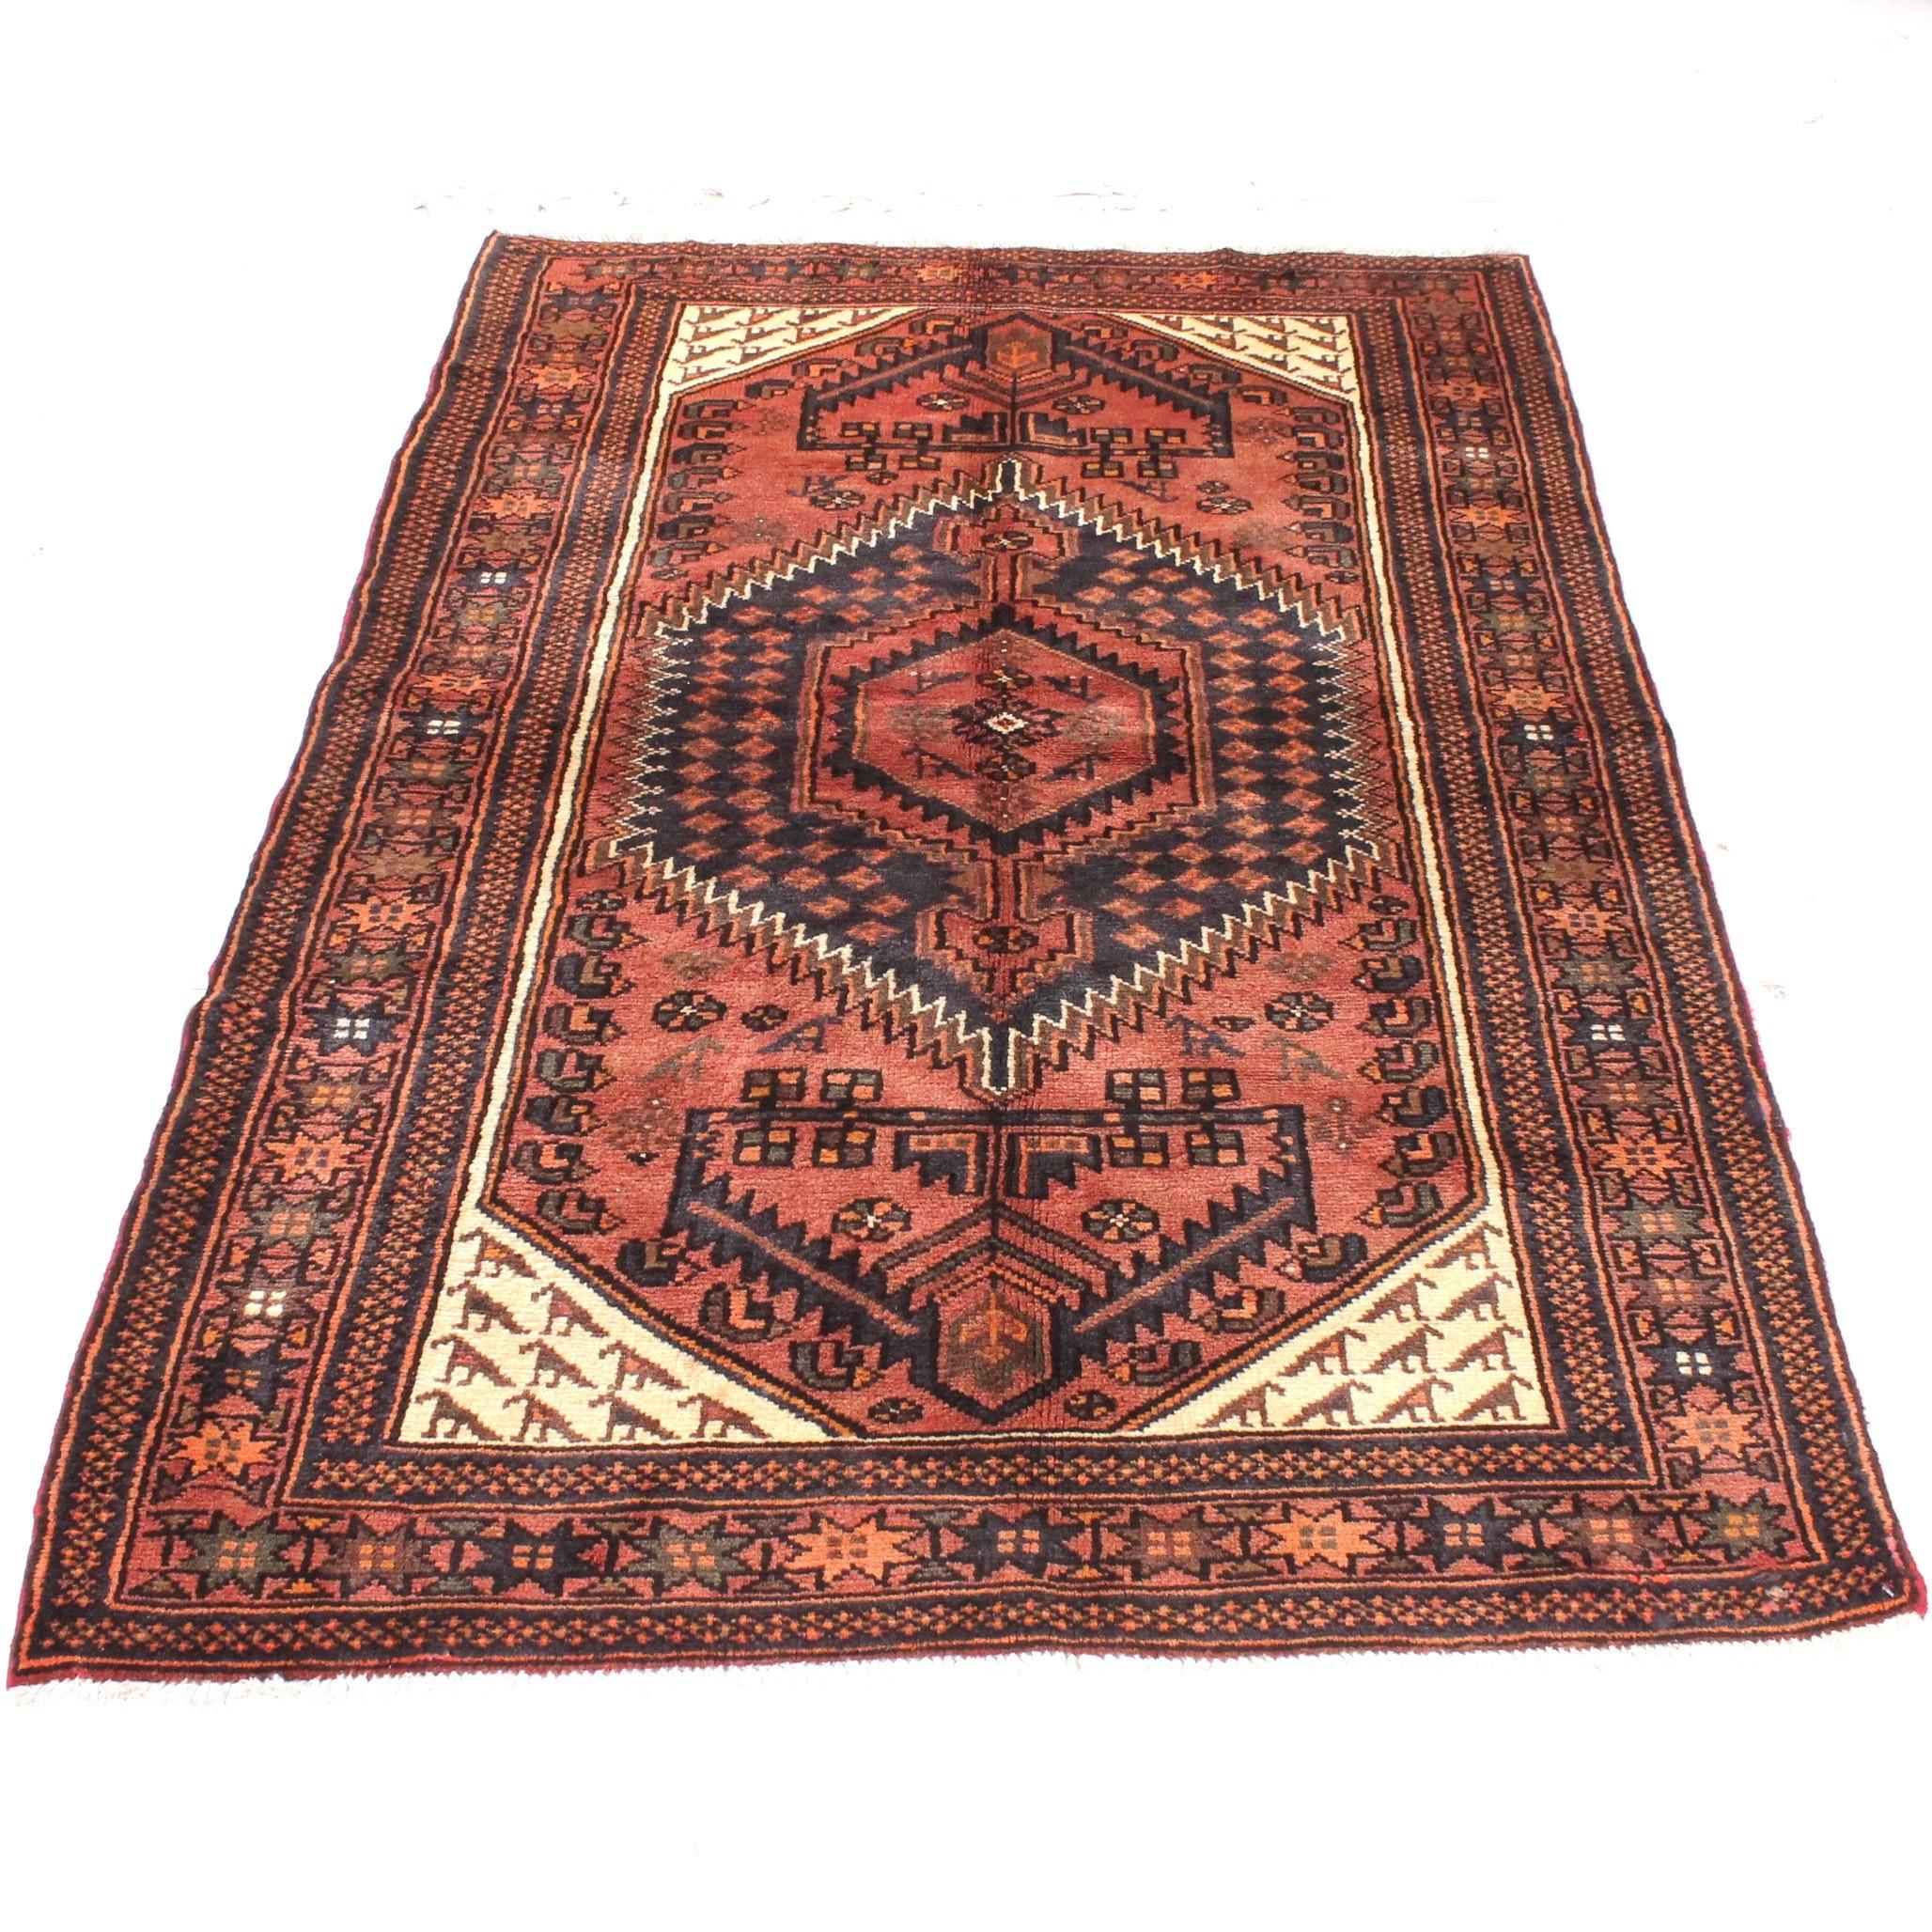 4' x 7' Fine Hand-Knotted Persian Zanjan Rug